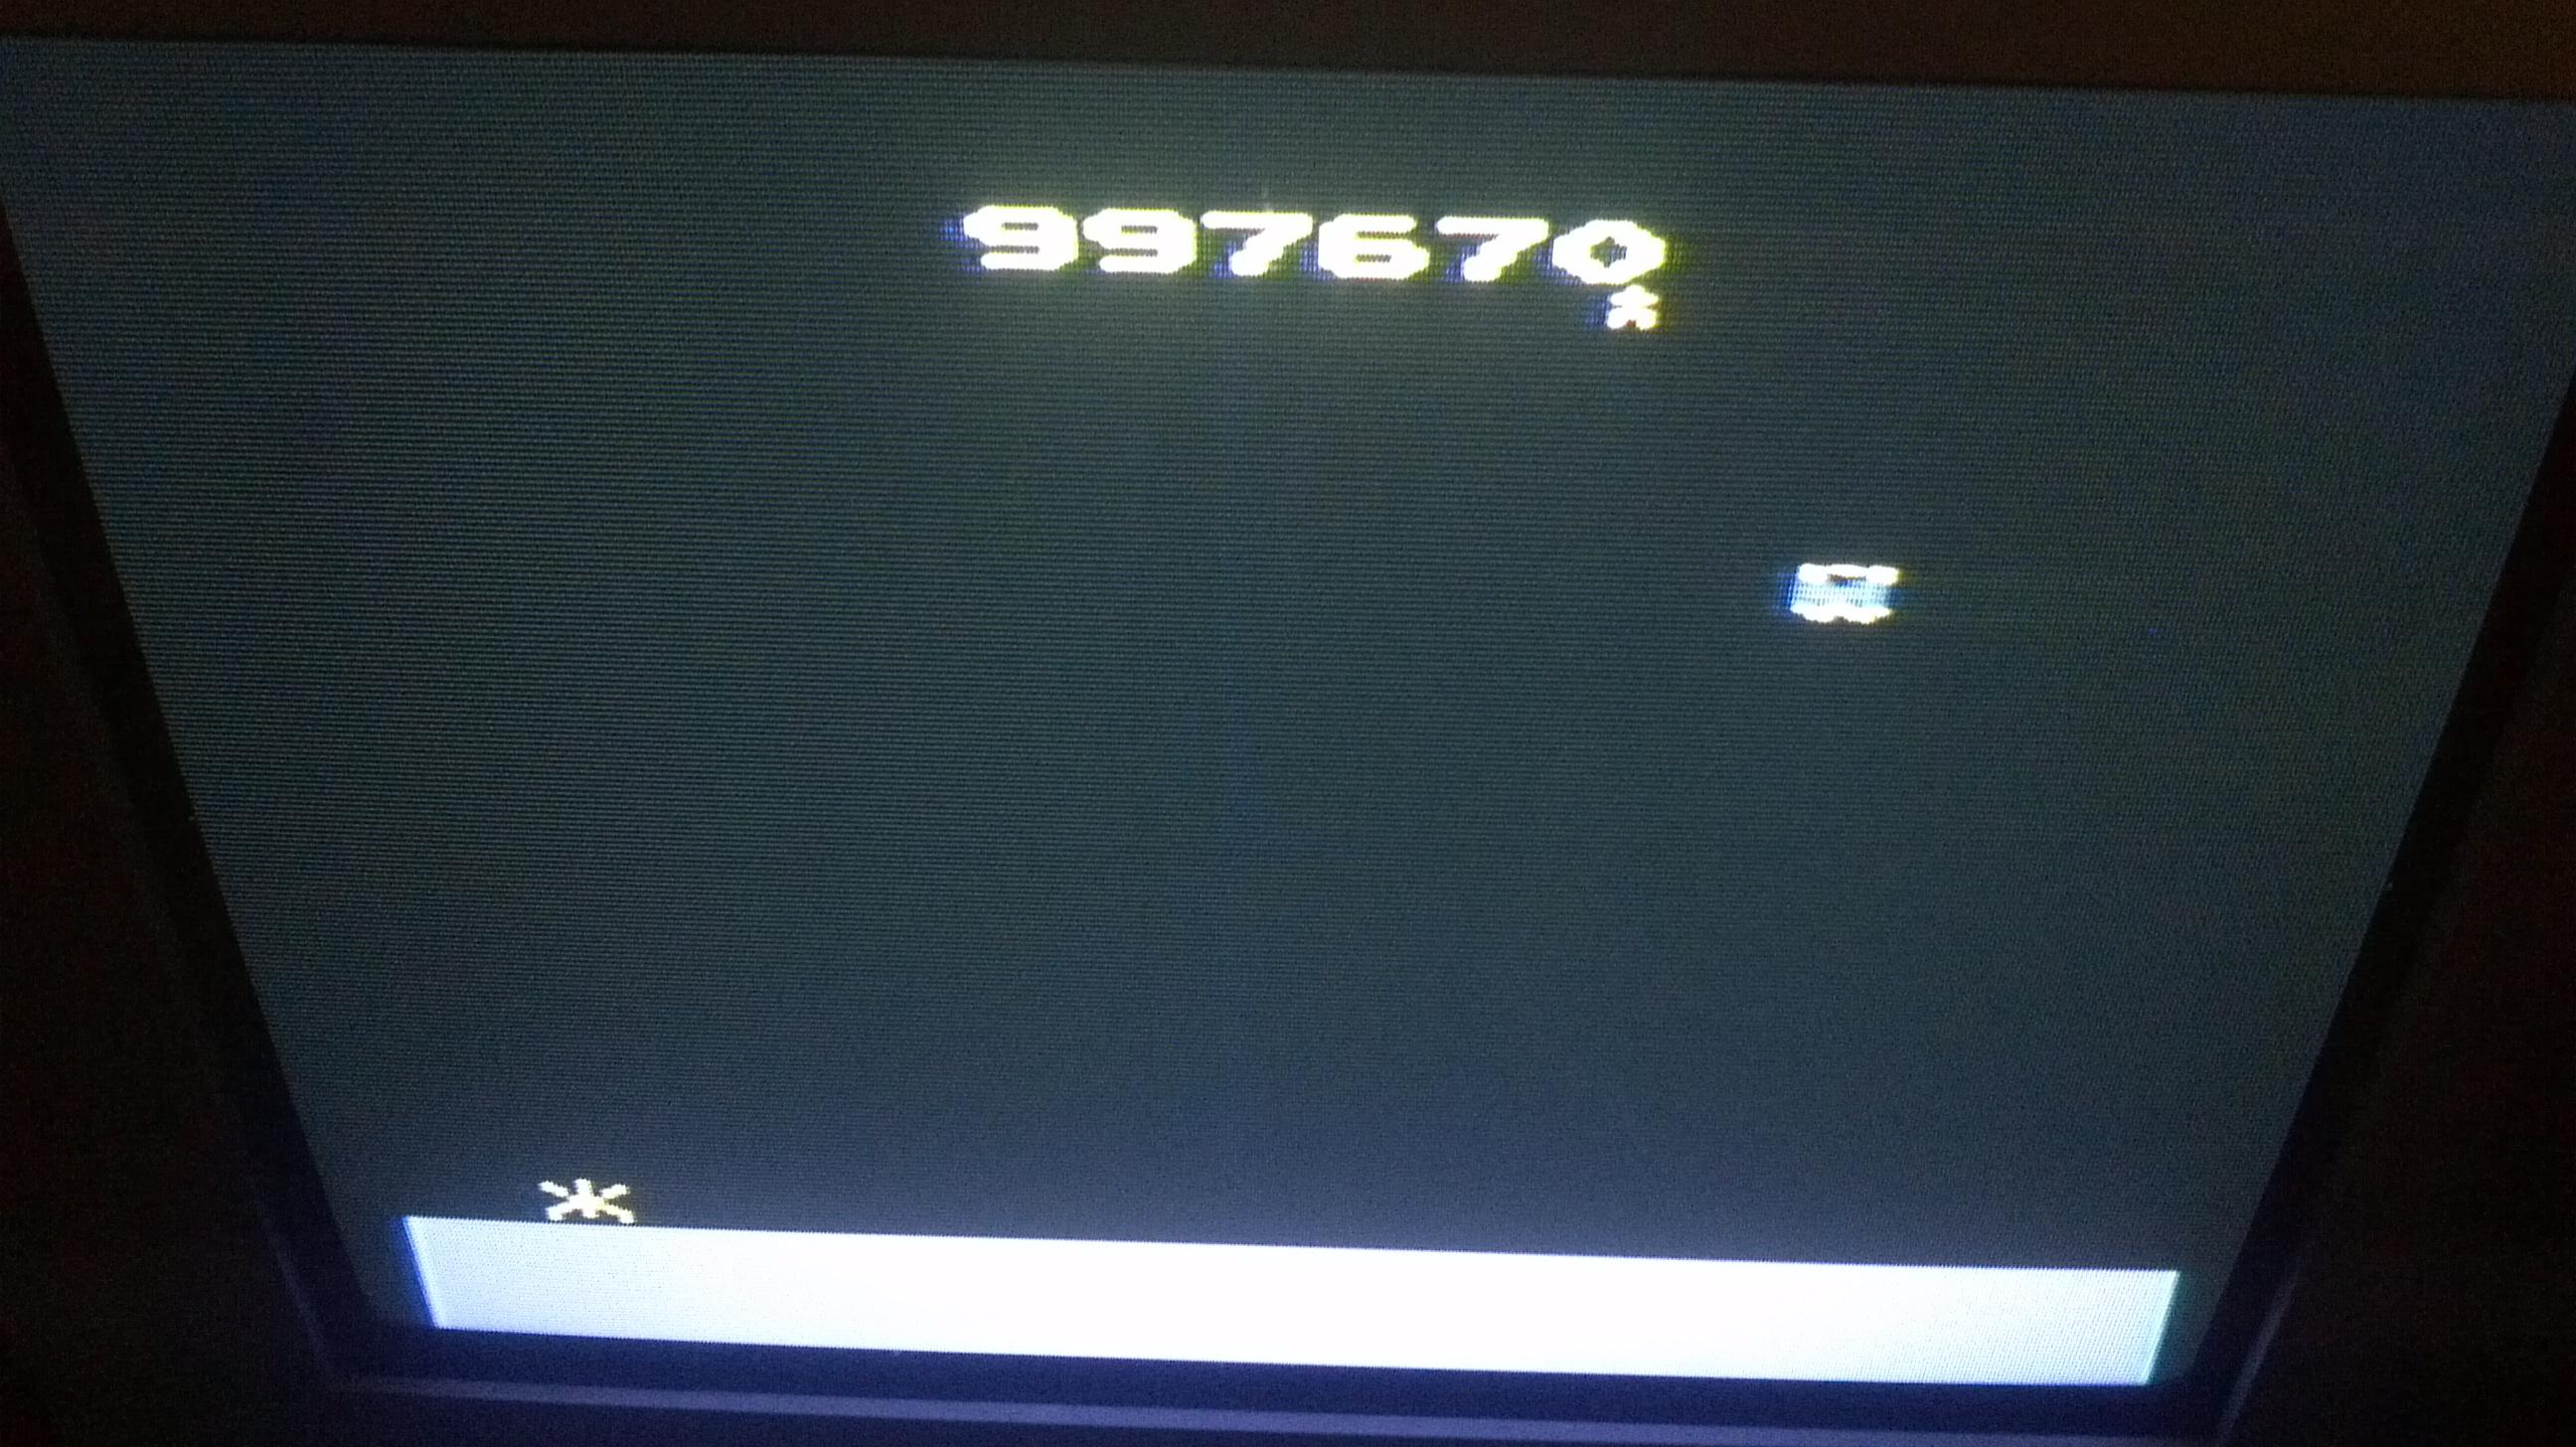 Liduario: Phoenix (Atari 2600 Novice/B) 997,670 points on 2014-03-11 21:08:14